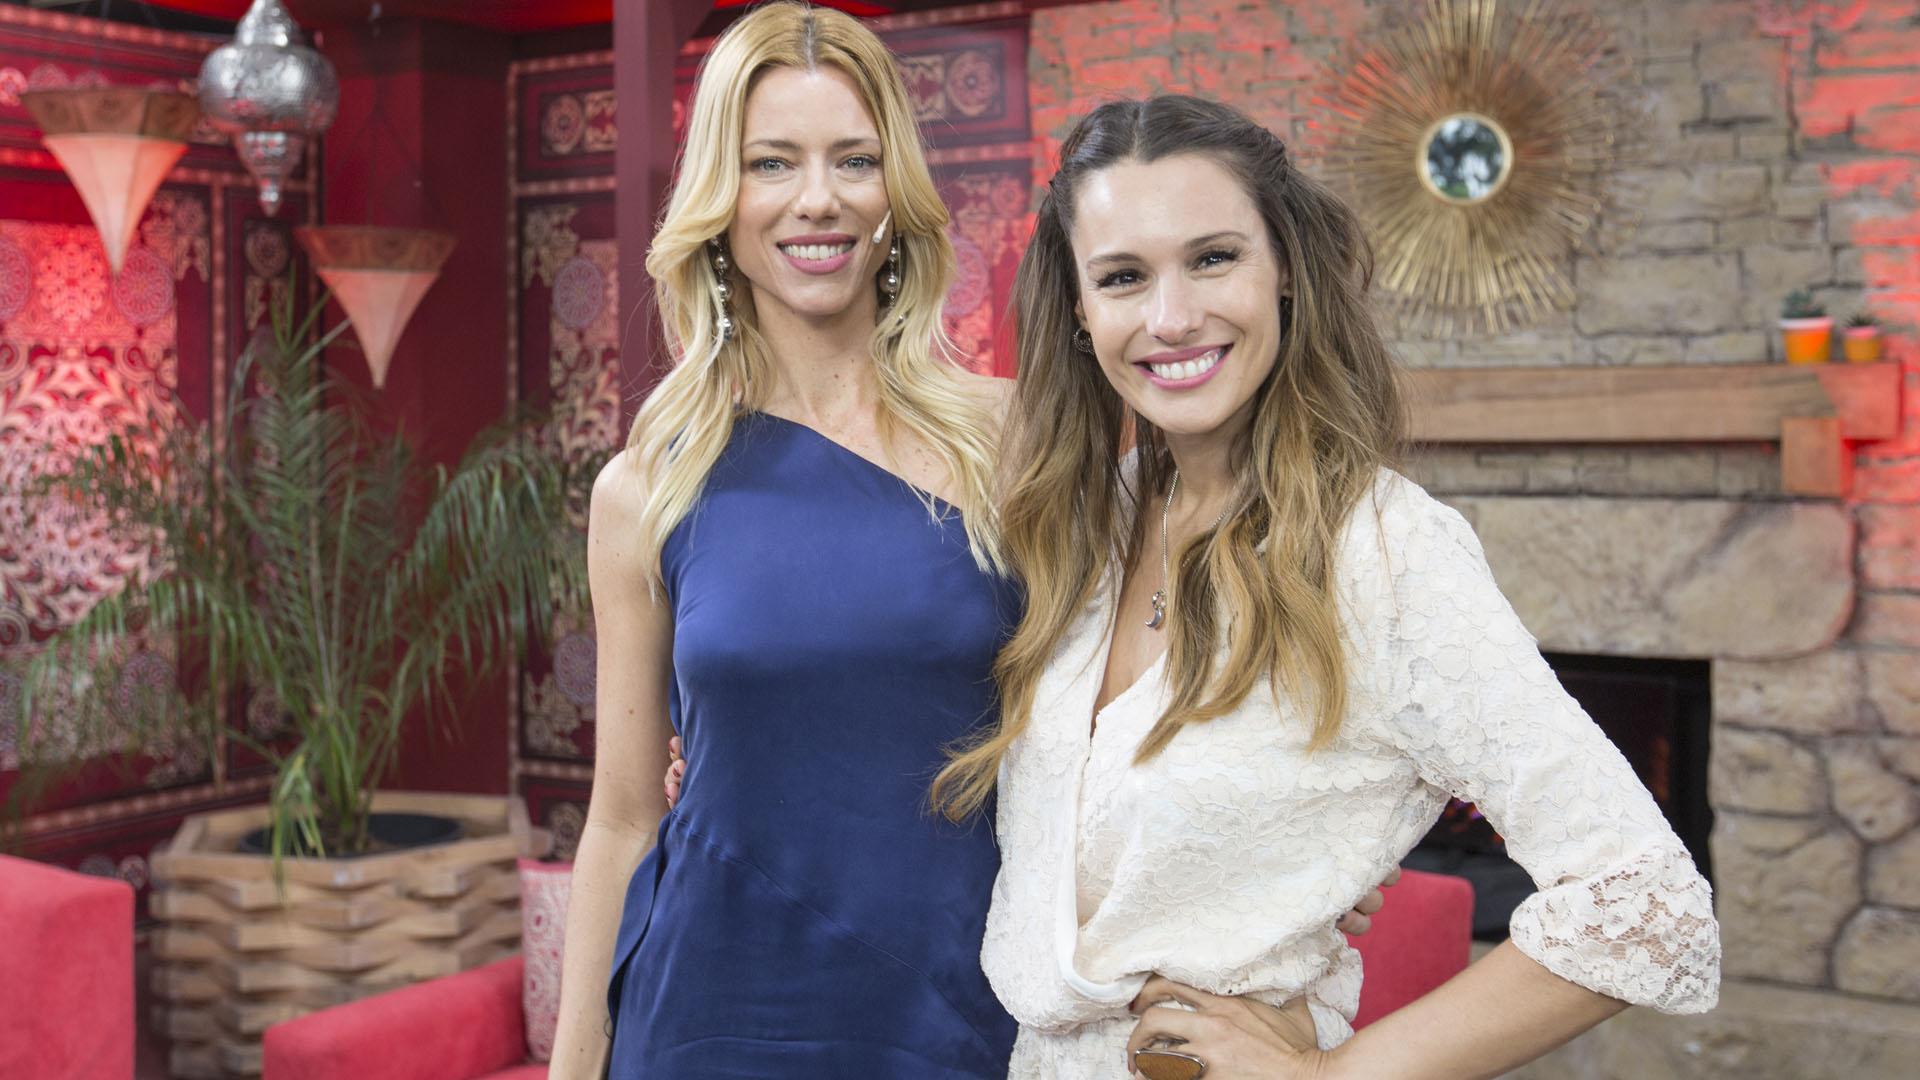 Nicole Neumann y Pampita Ardohain en KZO